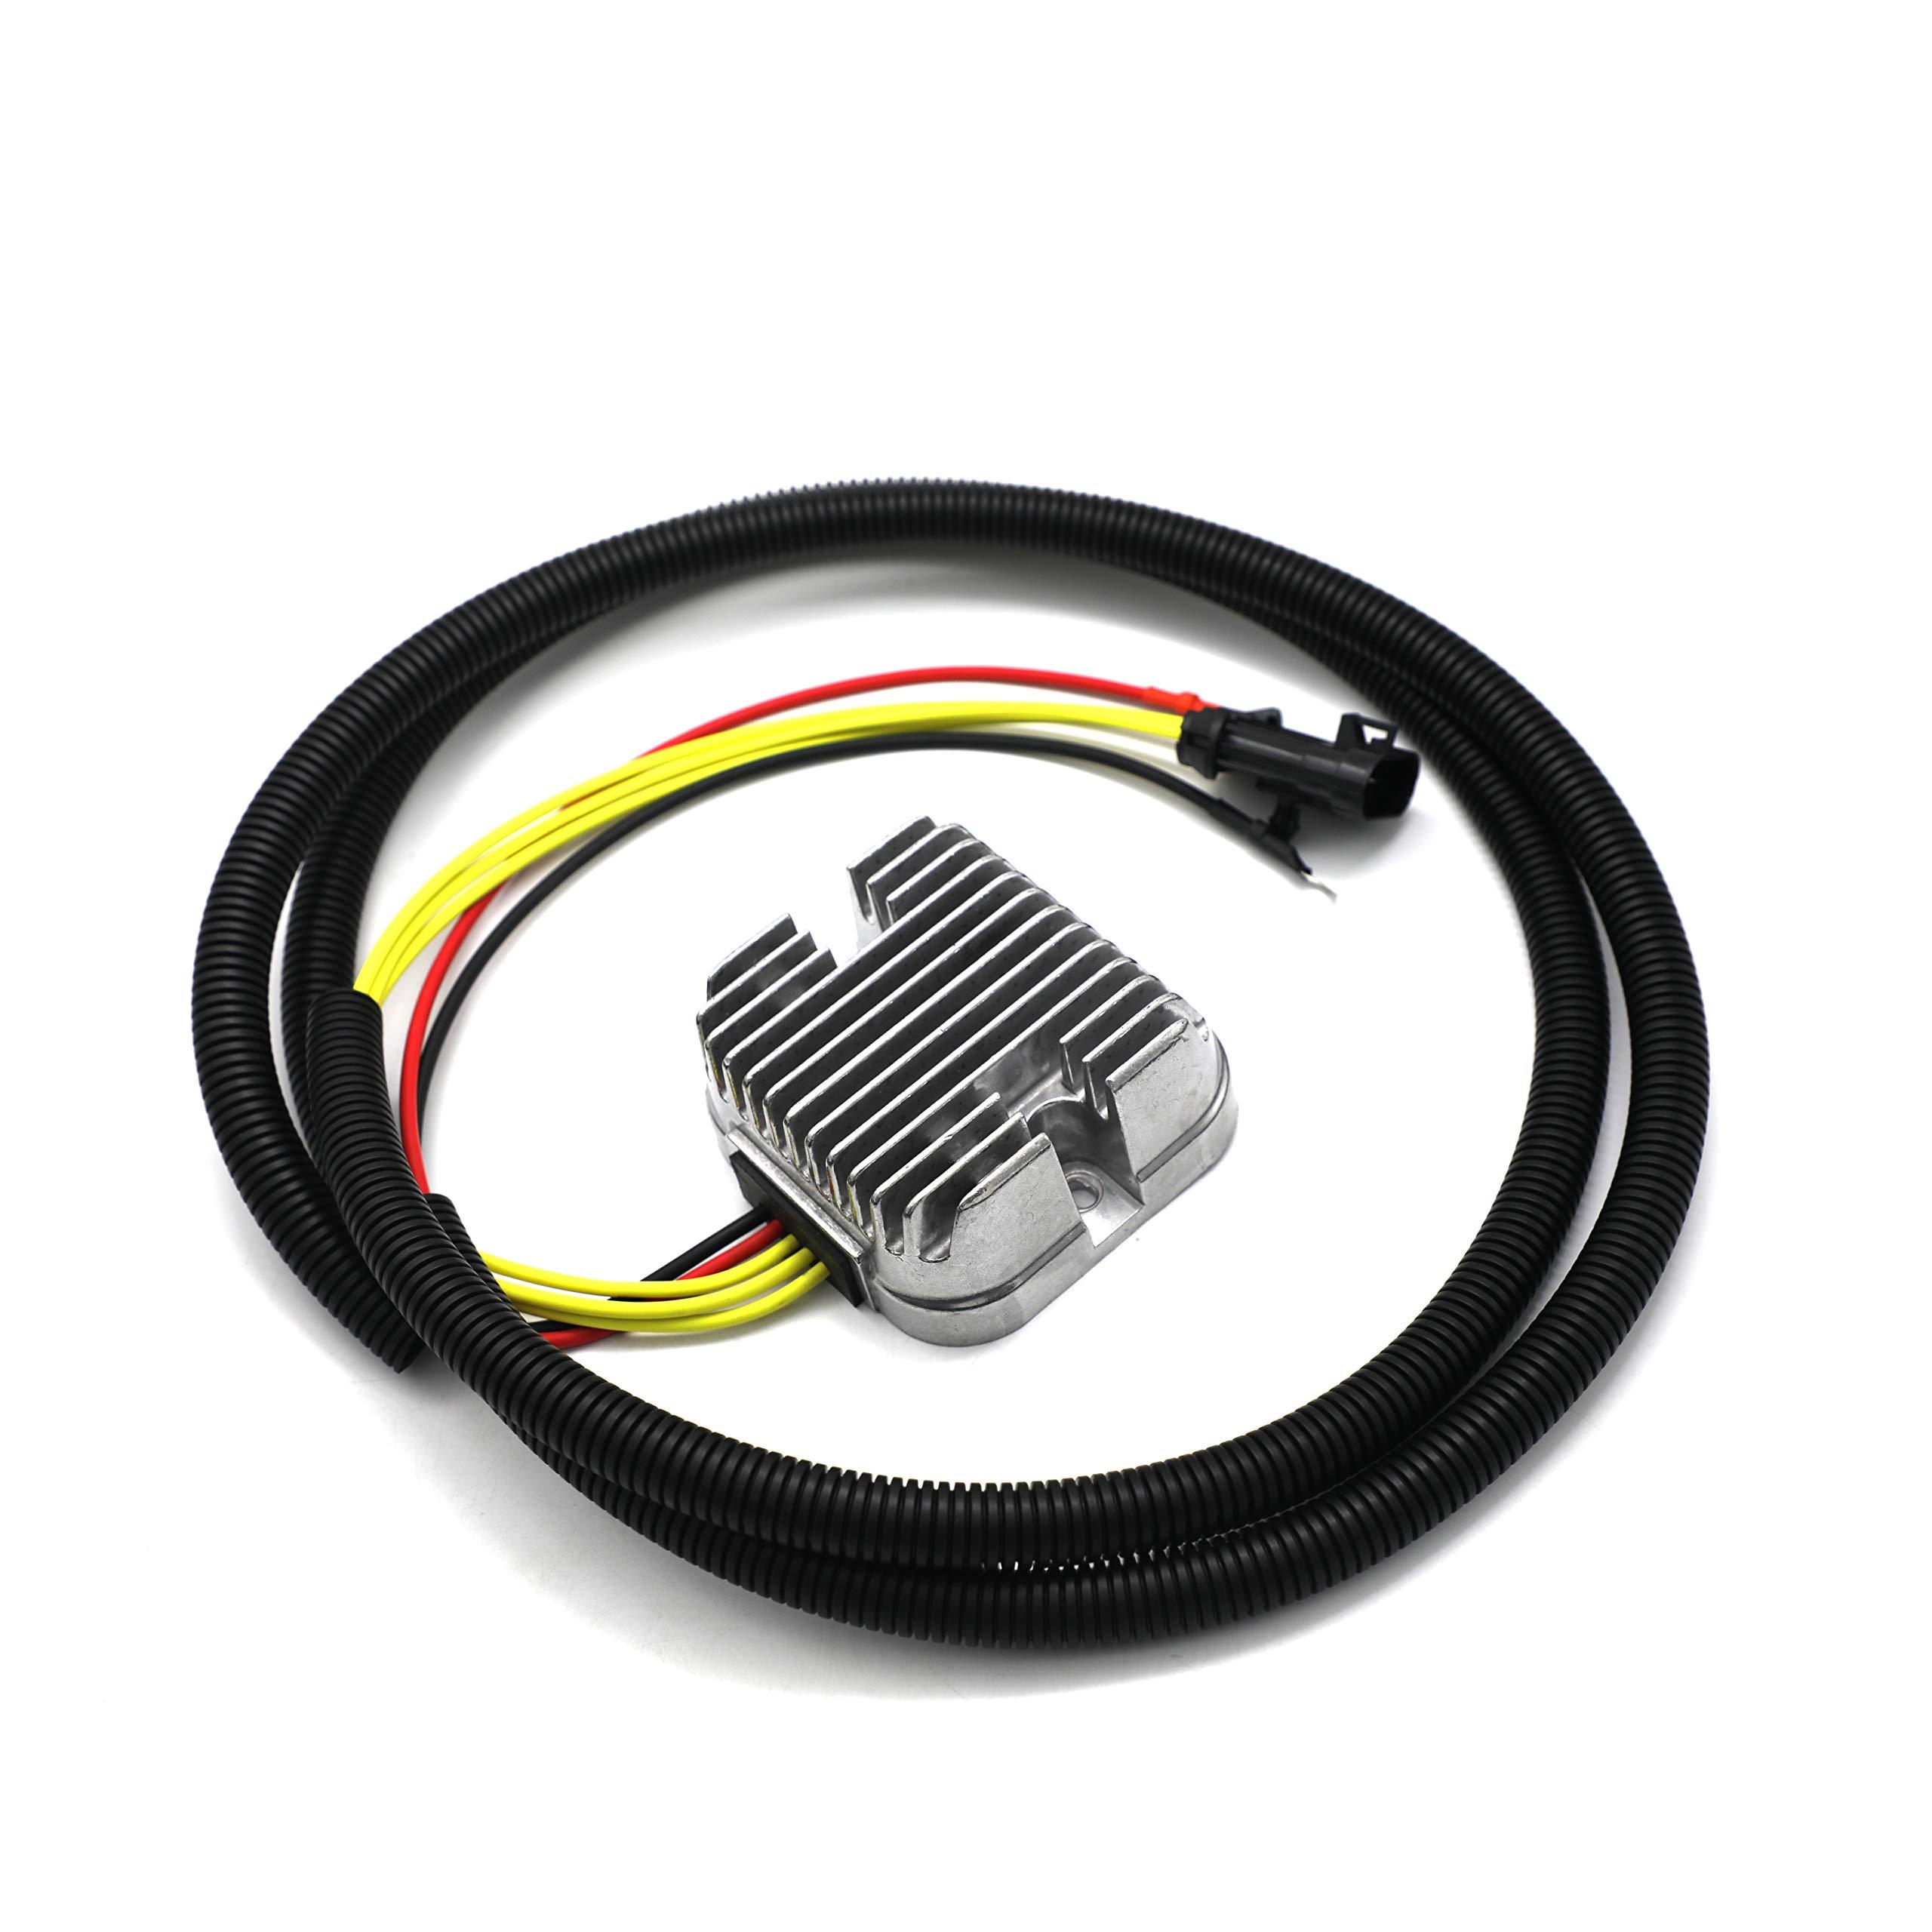 Line length 59in Mosfet Voltage Regulator Rectifier For Polaris Hawkeye 325/Sportsman 325 ETX/Sportsman 450 HO//Sportsman 570/570 Touring/X2 570 2014-2018 4014543 4015230 4015214 4015231 4014405 by weishine